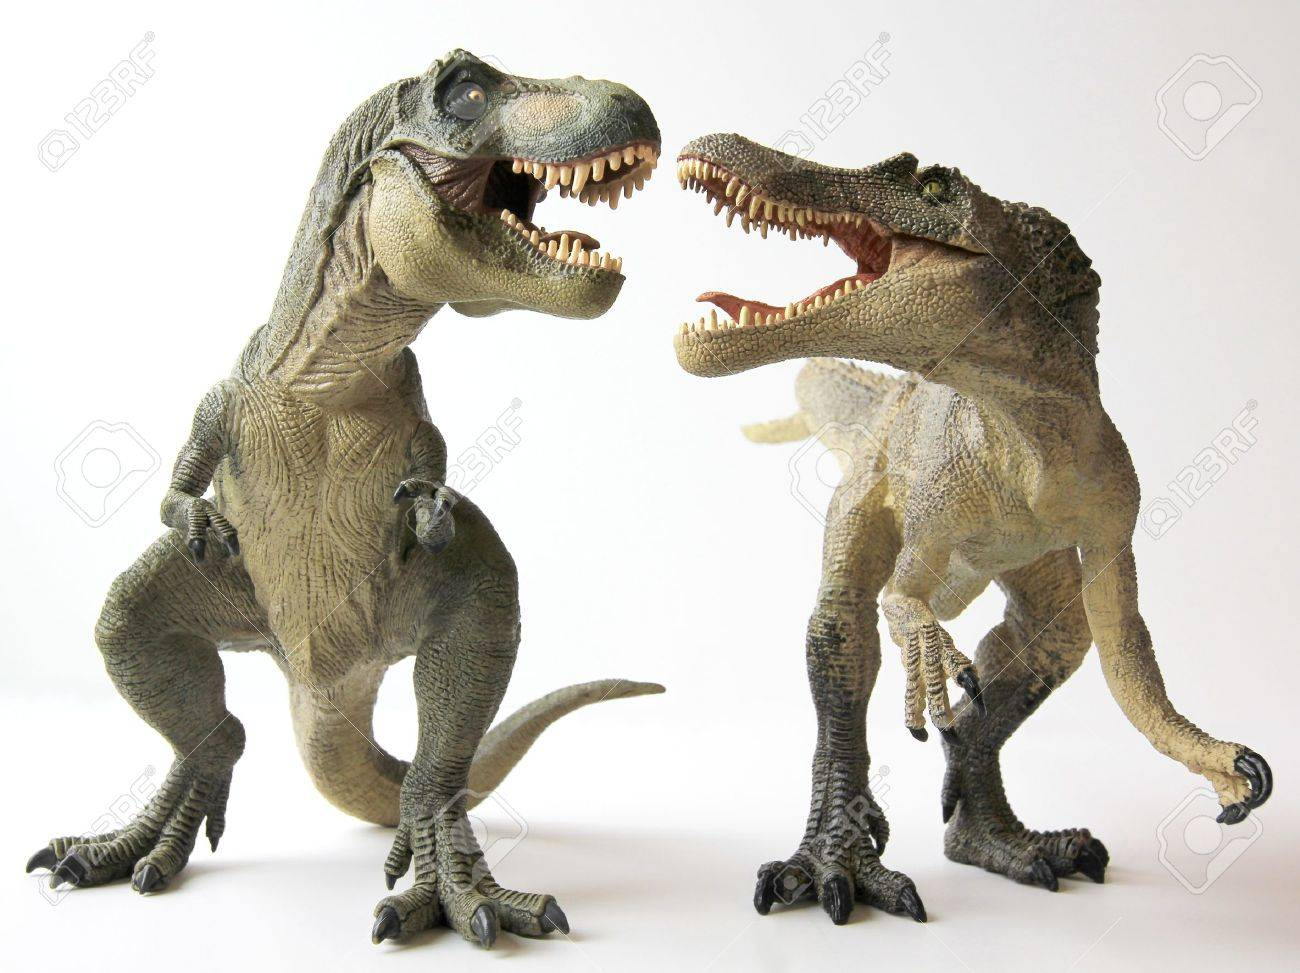 A Tyrannosaurus Rex Dinosaur Battles with a Spinosaurus - 9077272